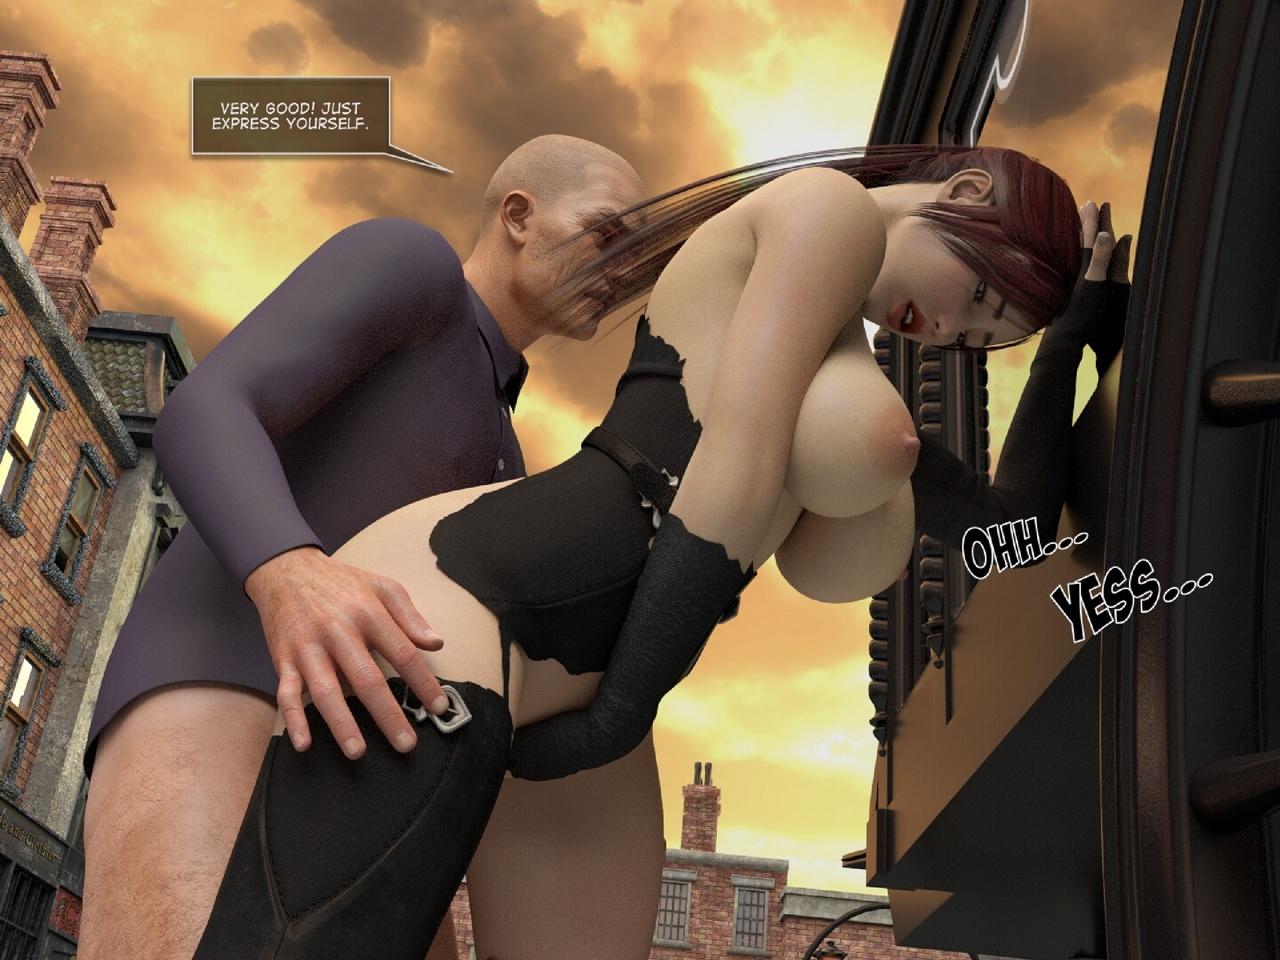 Hentia assassin girl porn erotica galleries